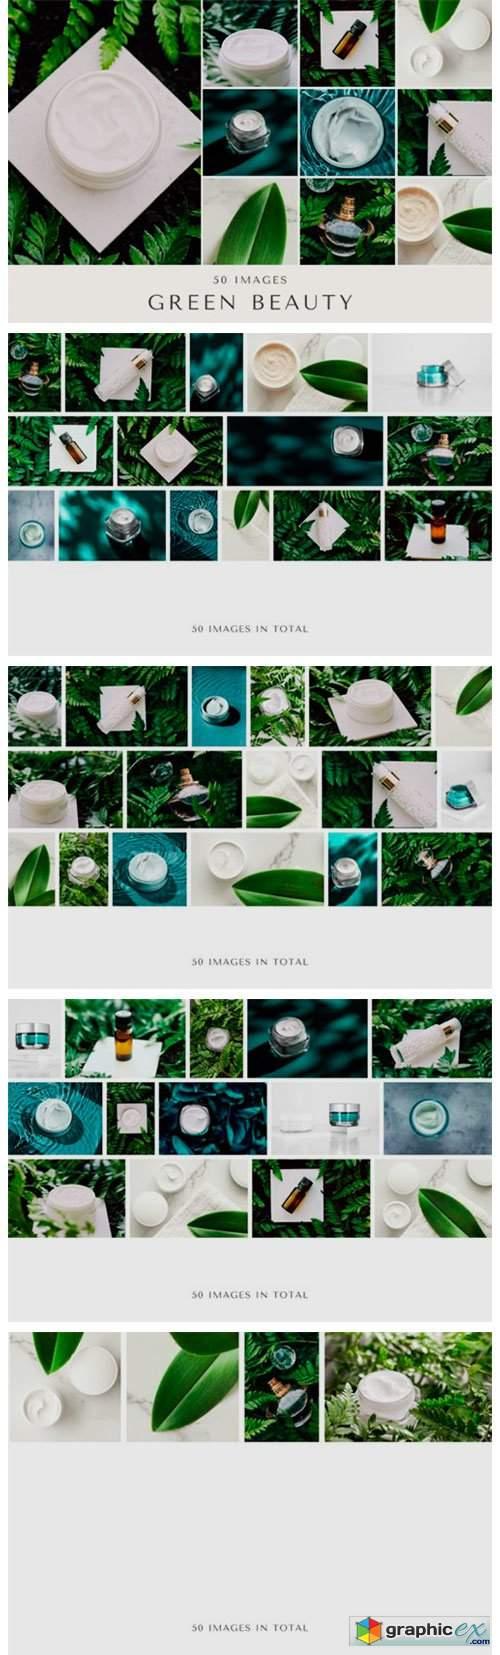 50 Images | Green Beauty Bundle